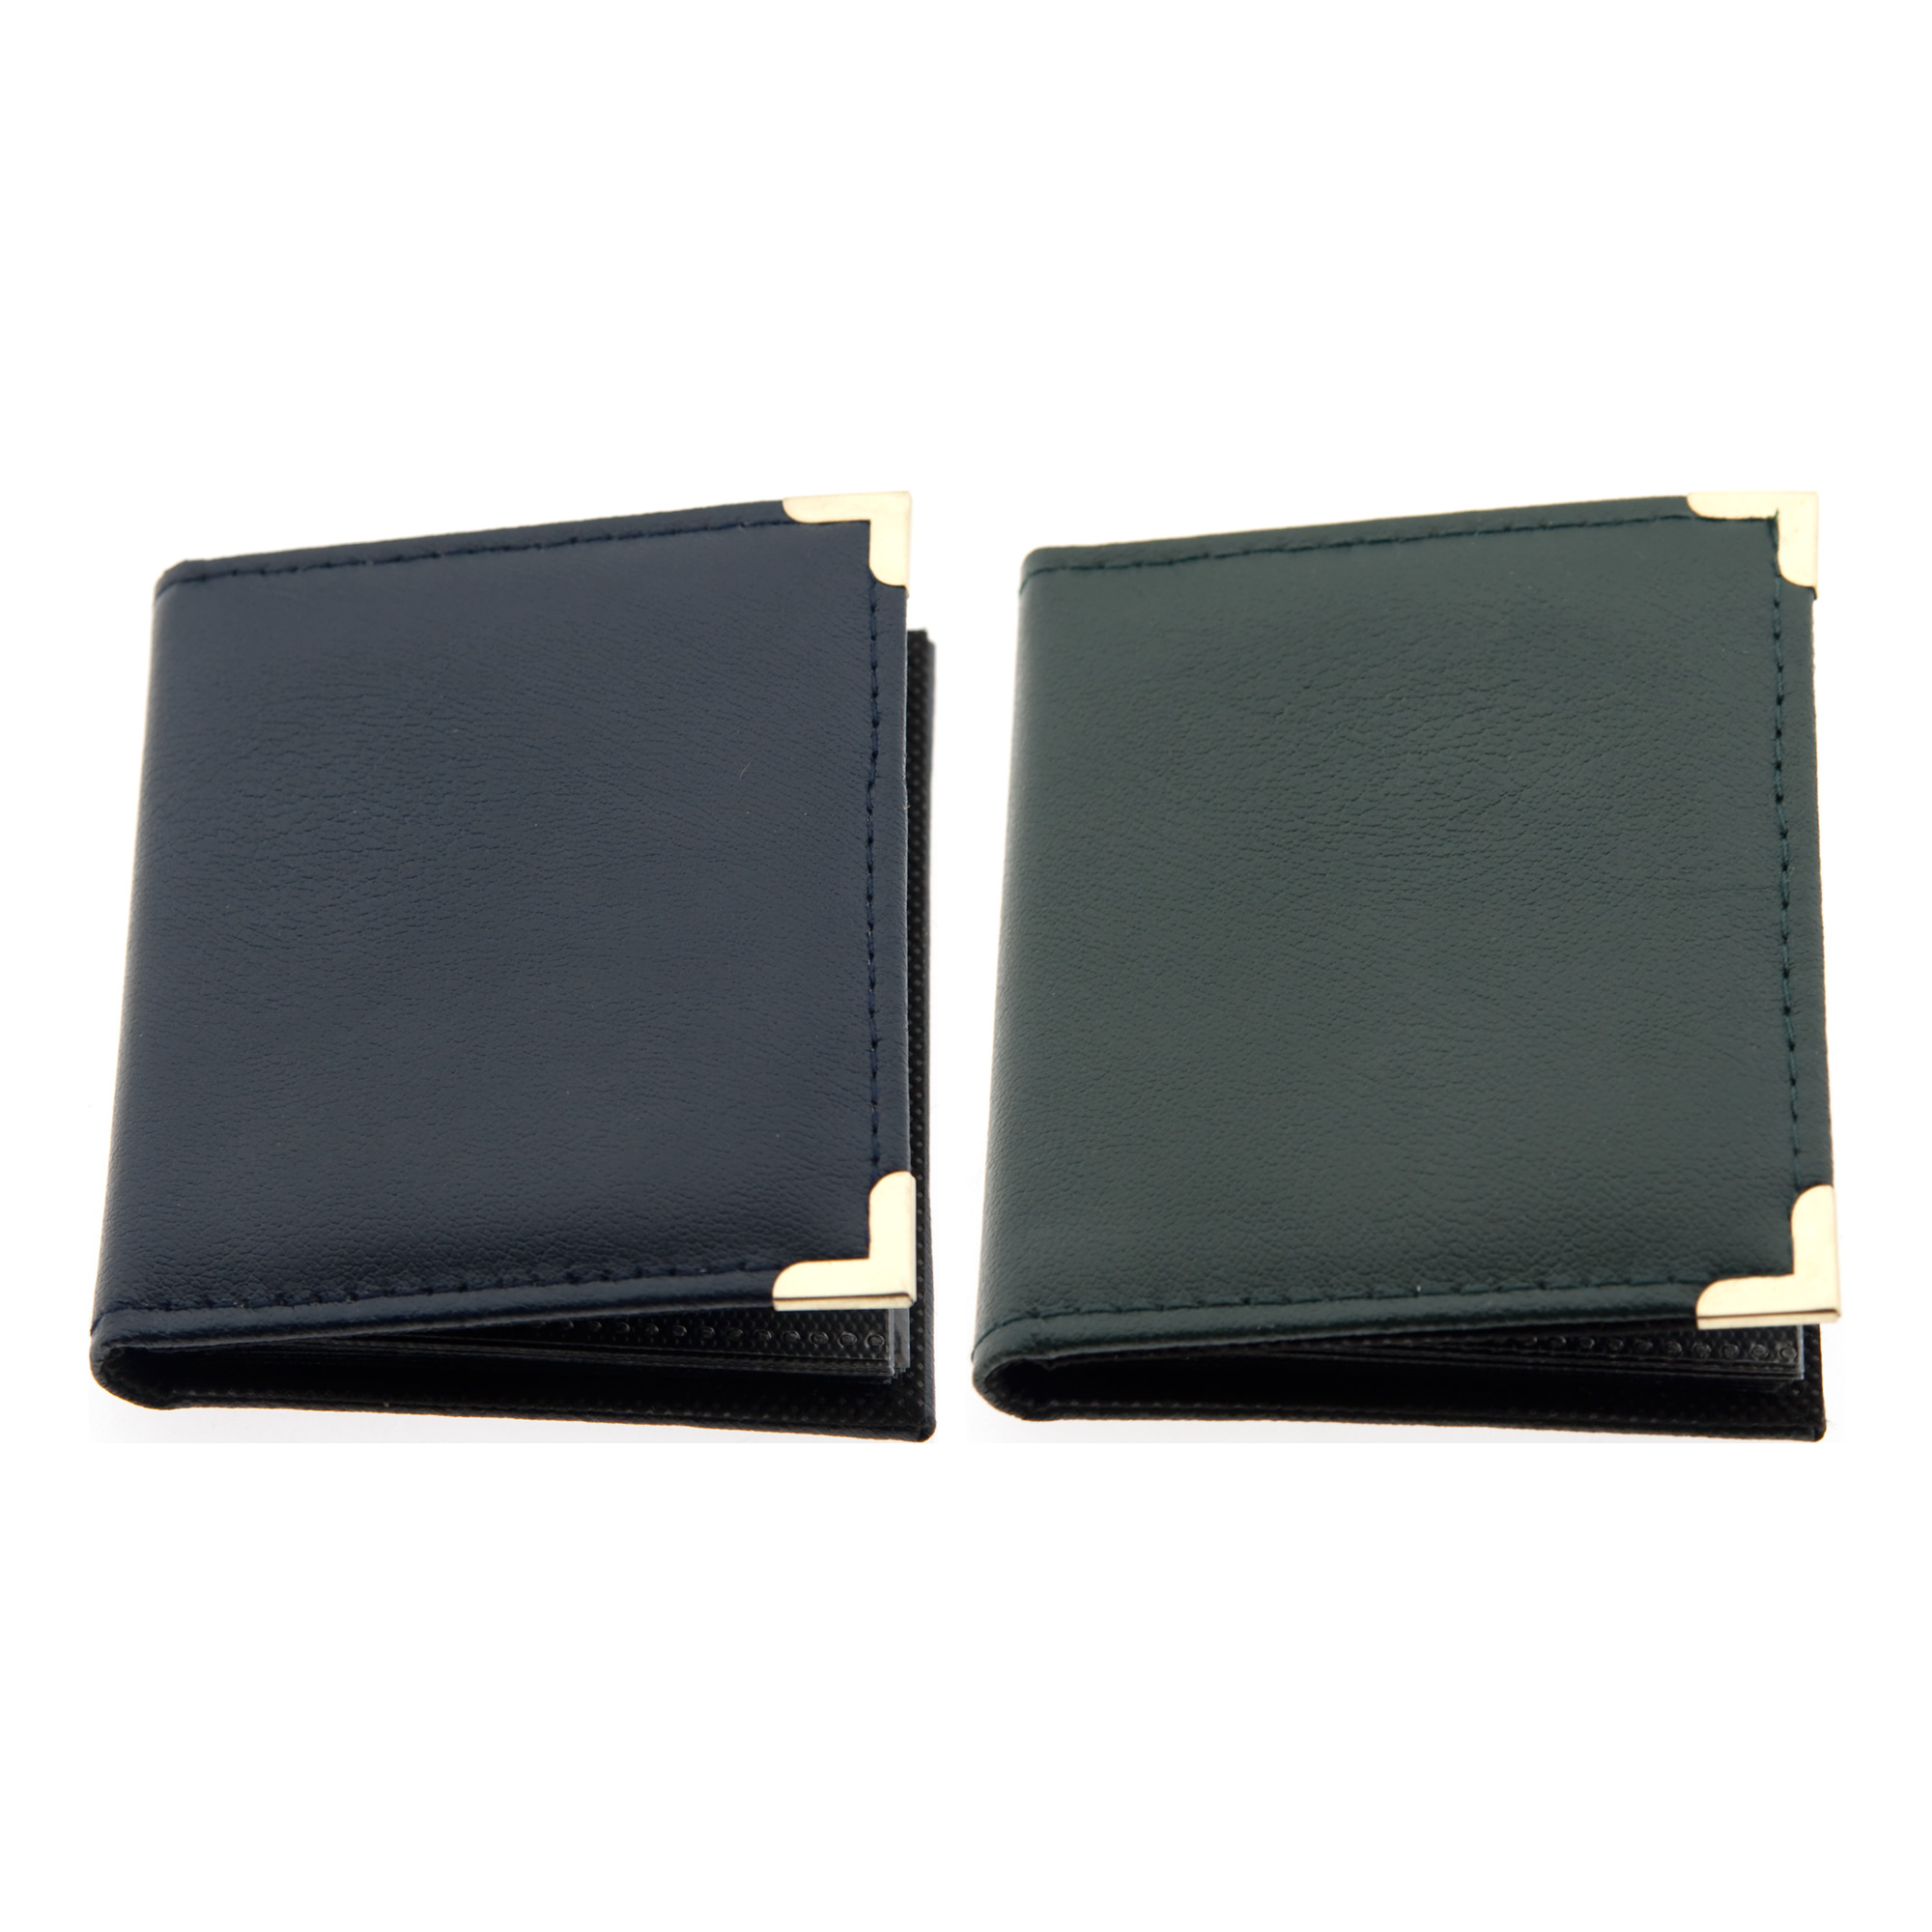 2.5 x 3.5 In. Wallet SM23 Oxford Brass Corner Photo Album Assorted Colors